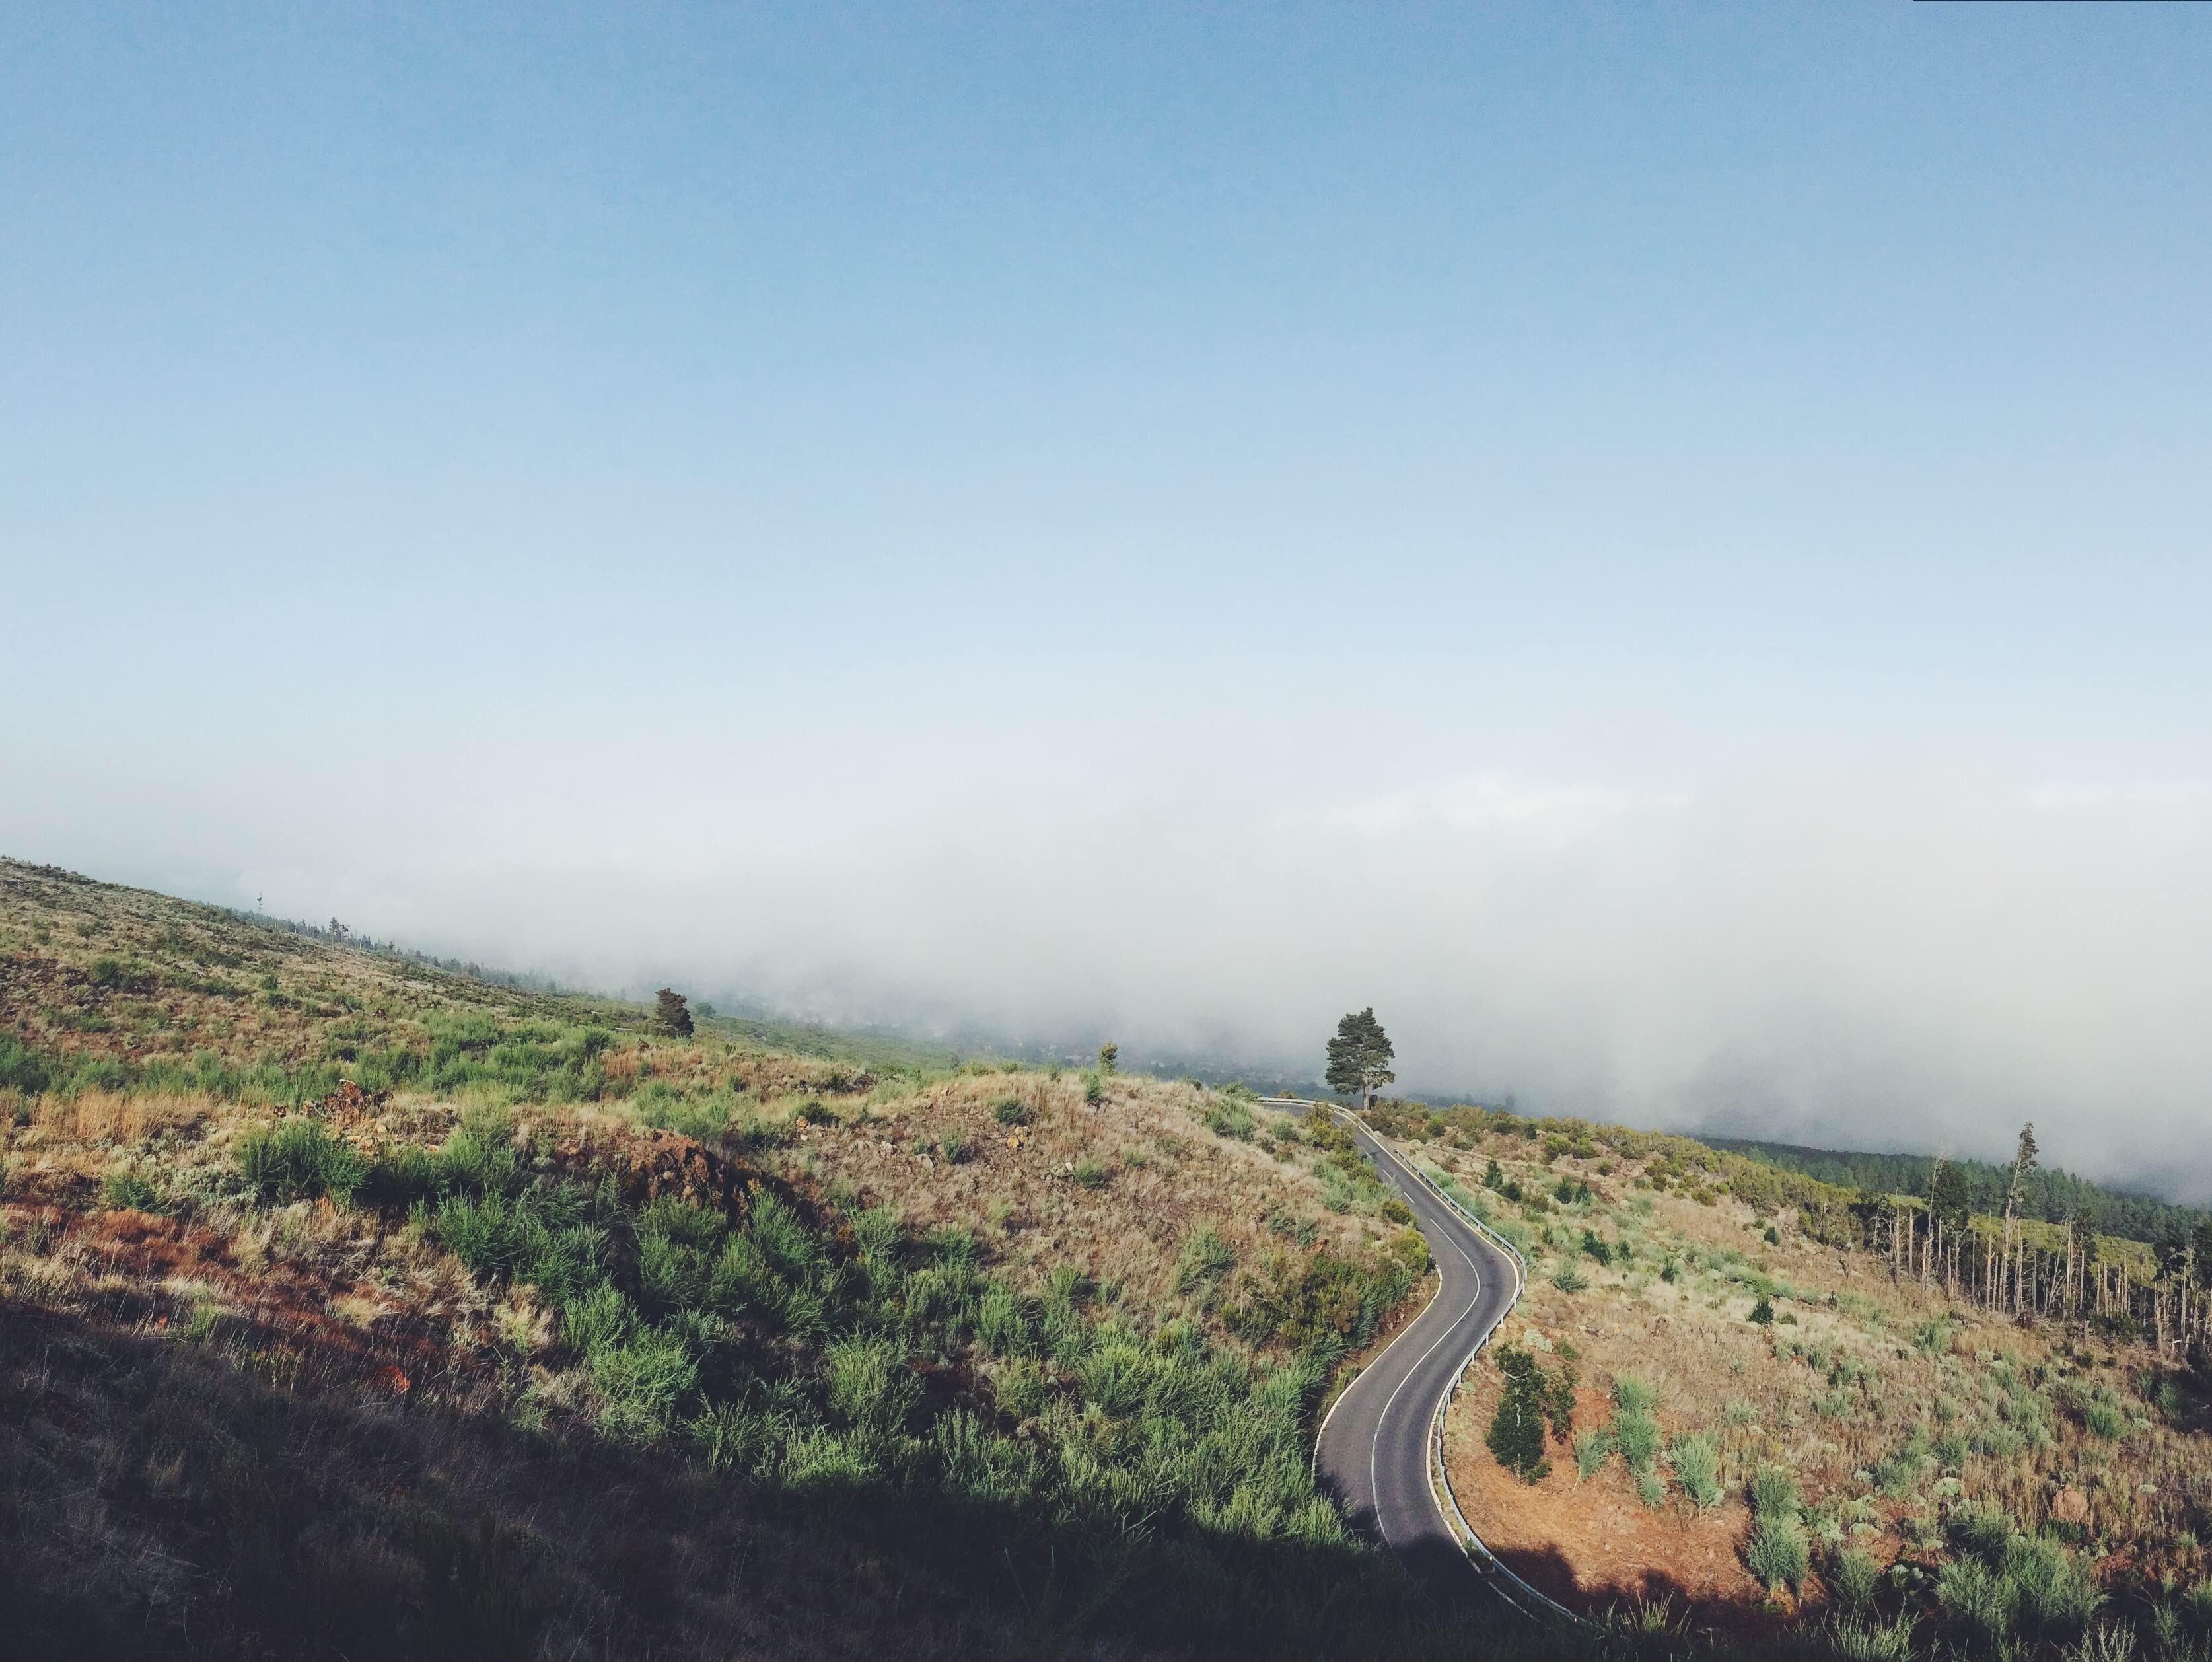 gray highway near green trees